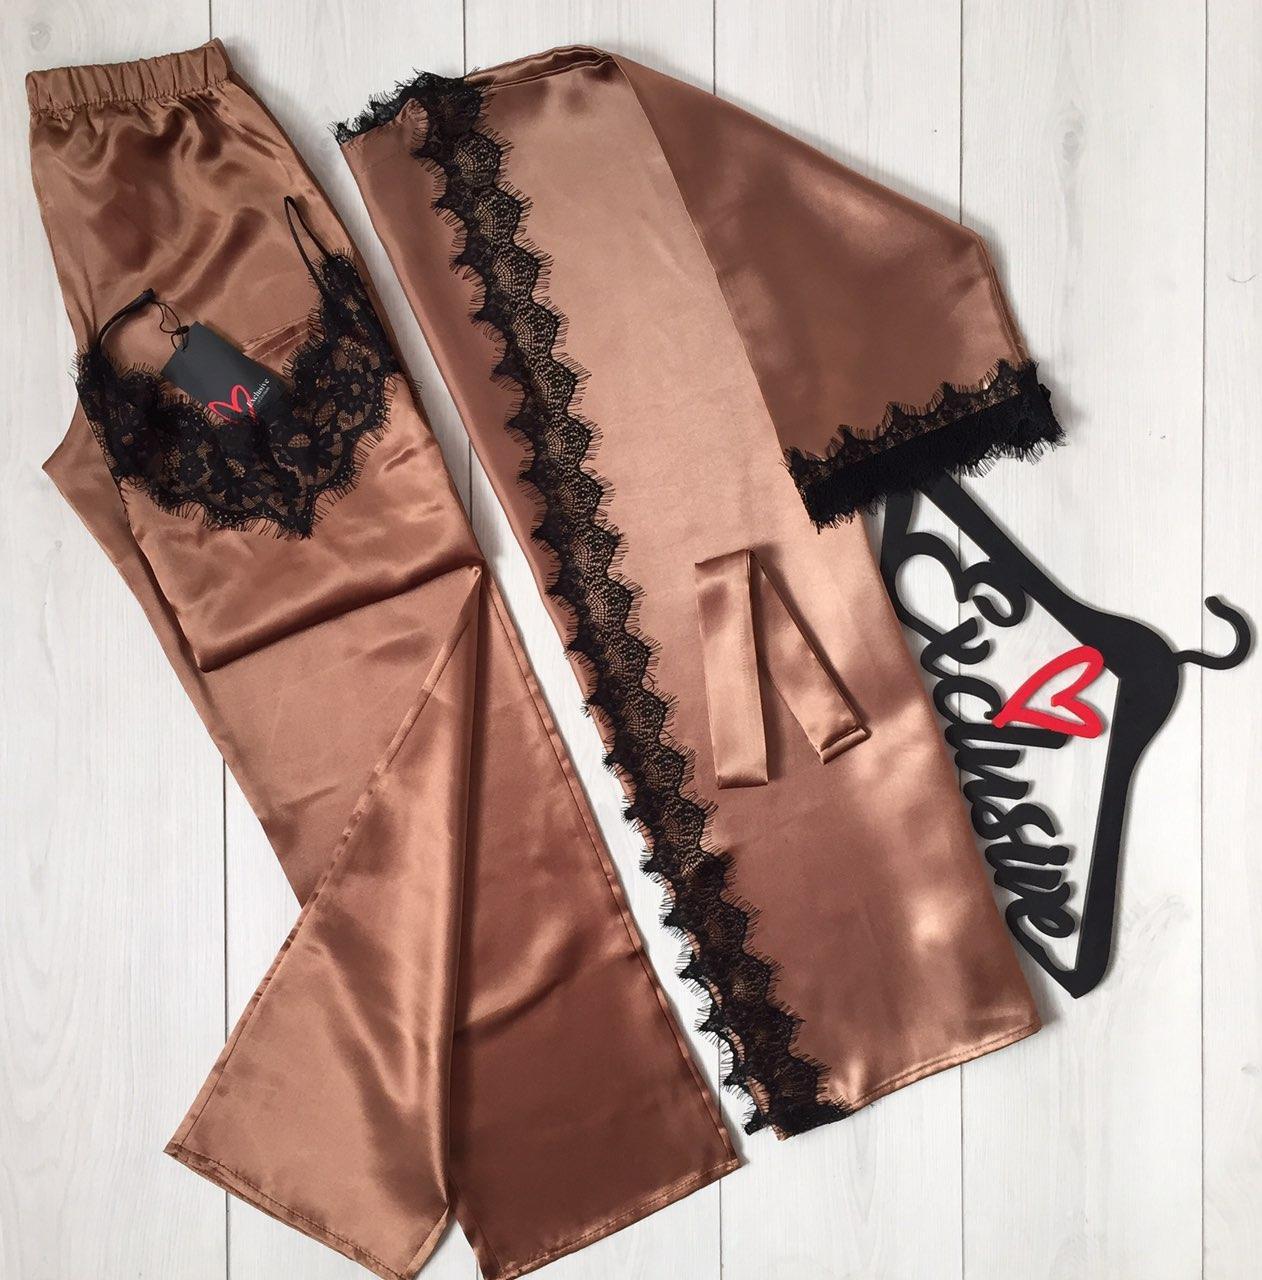 Комплект для дома халат майка и штаны